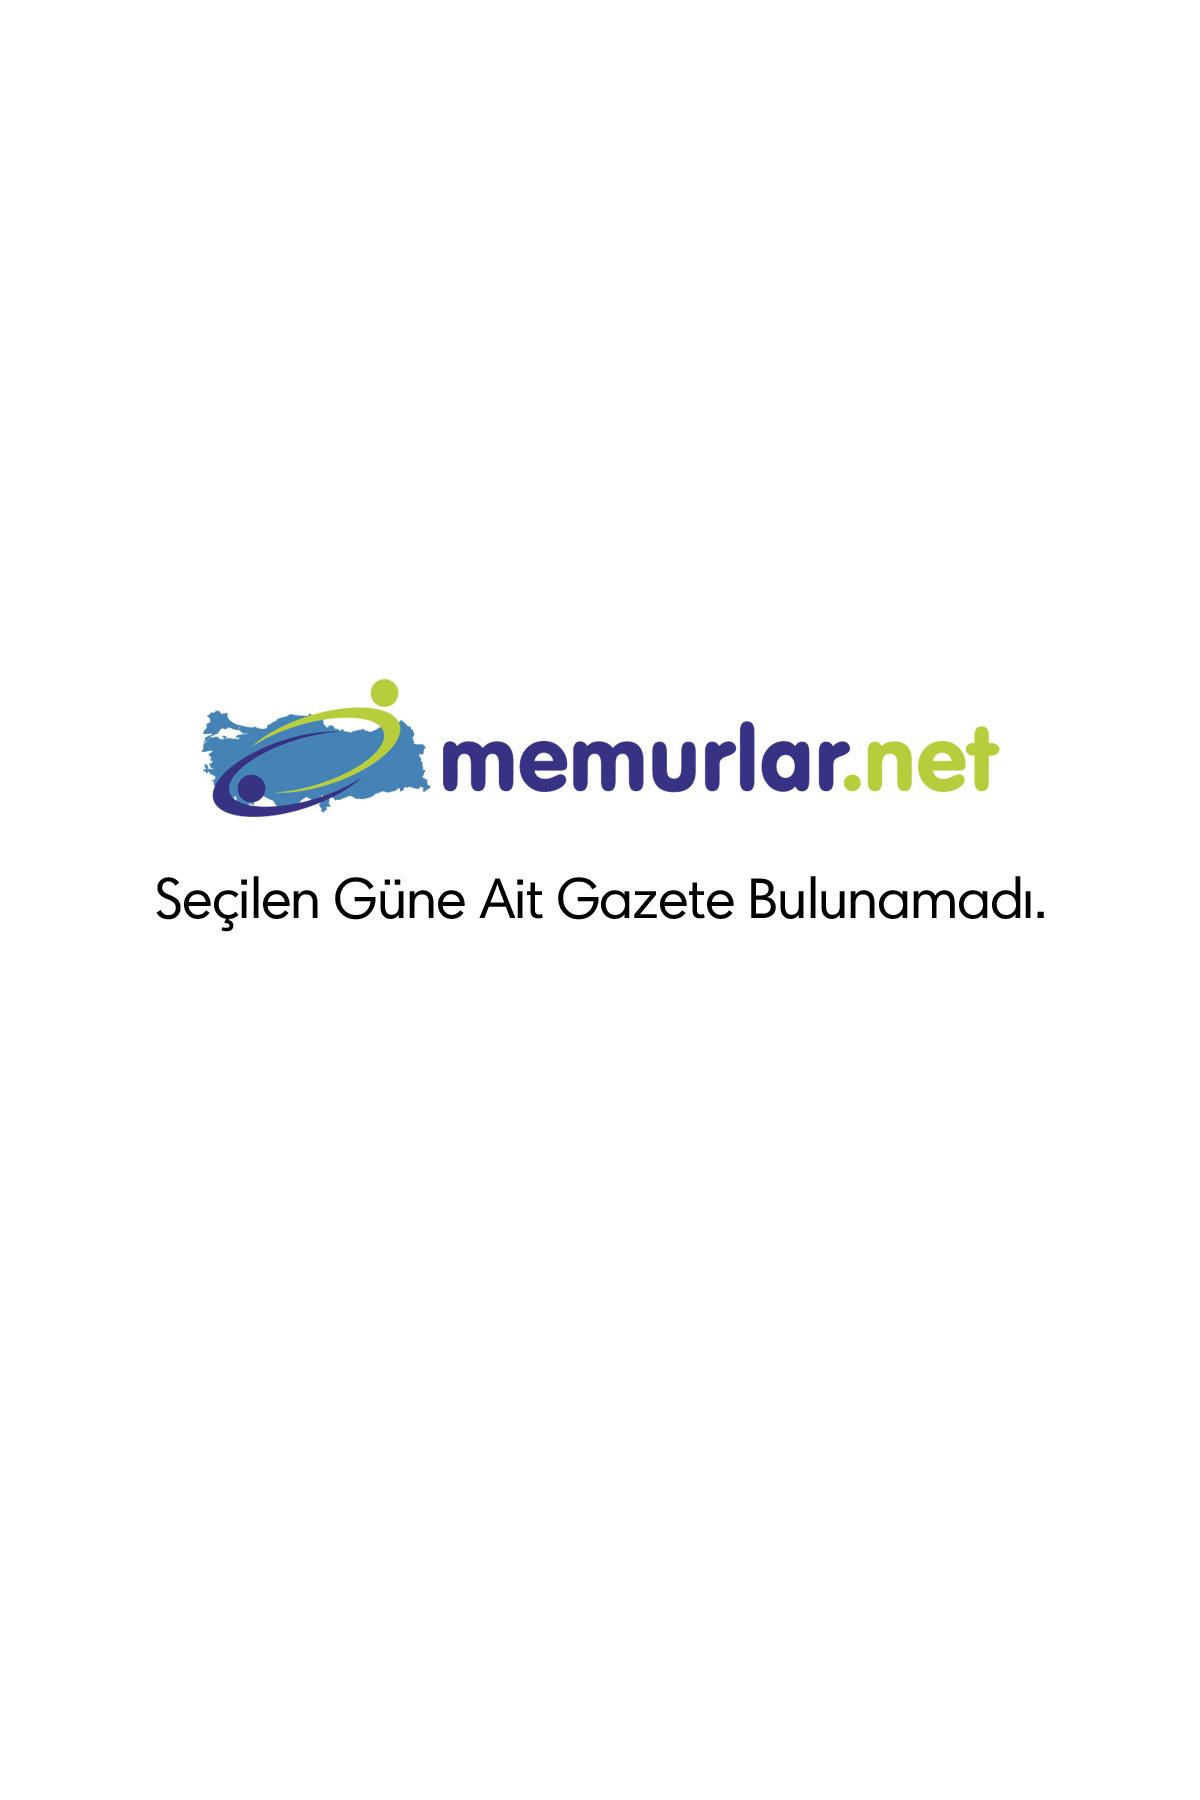 Yurt Gazetesi Manşeti